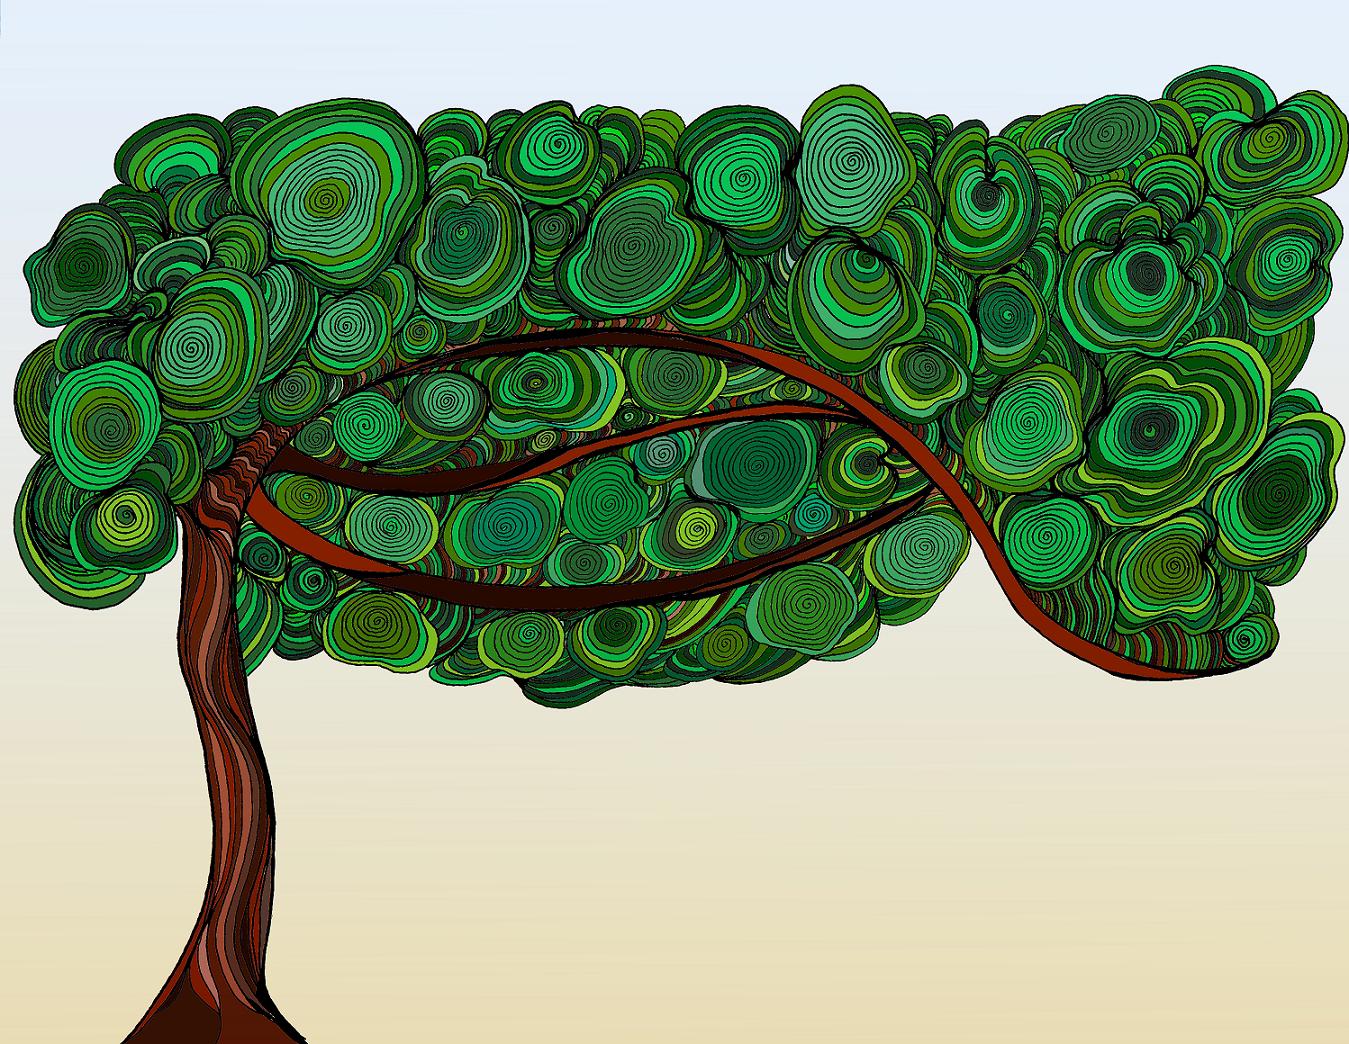 Southern Evergreen. By Agnieszka Grabon, PhD.